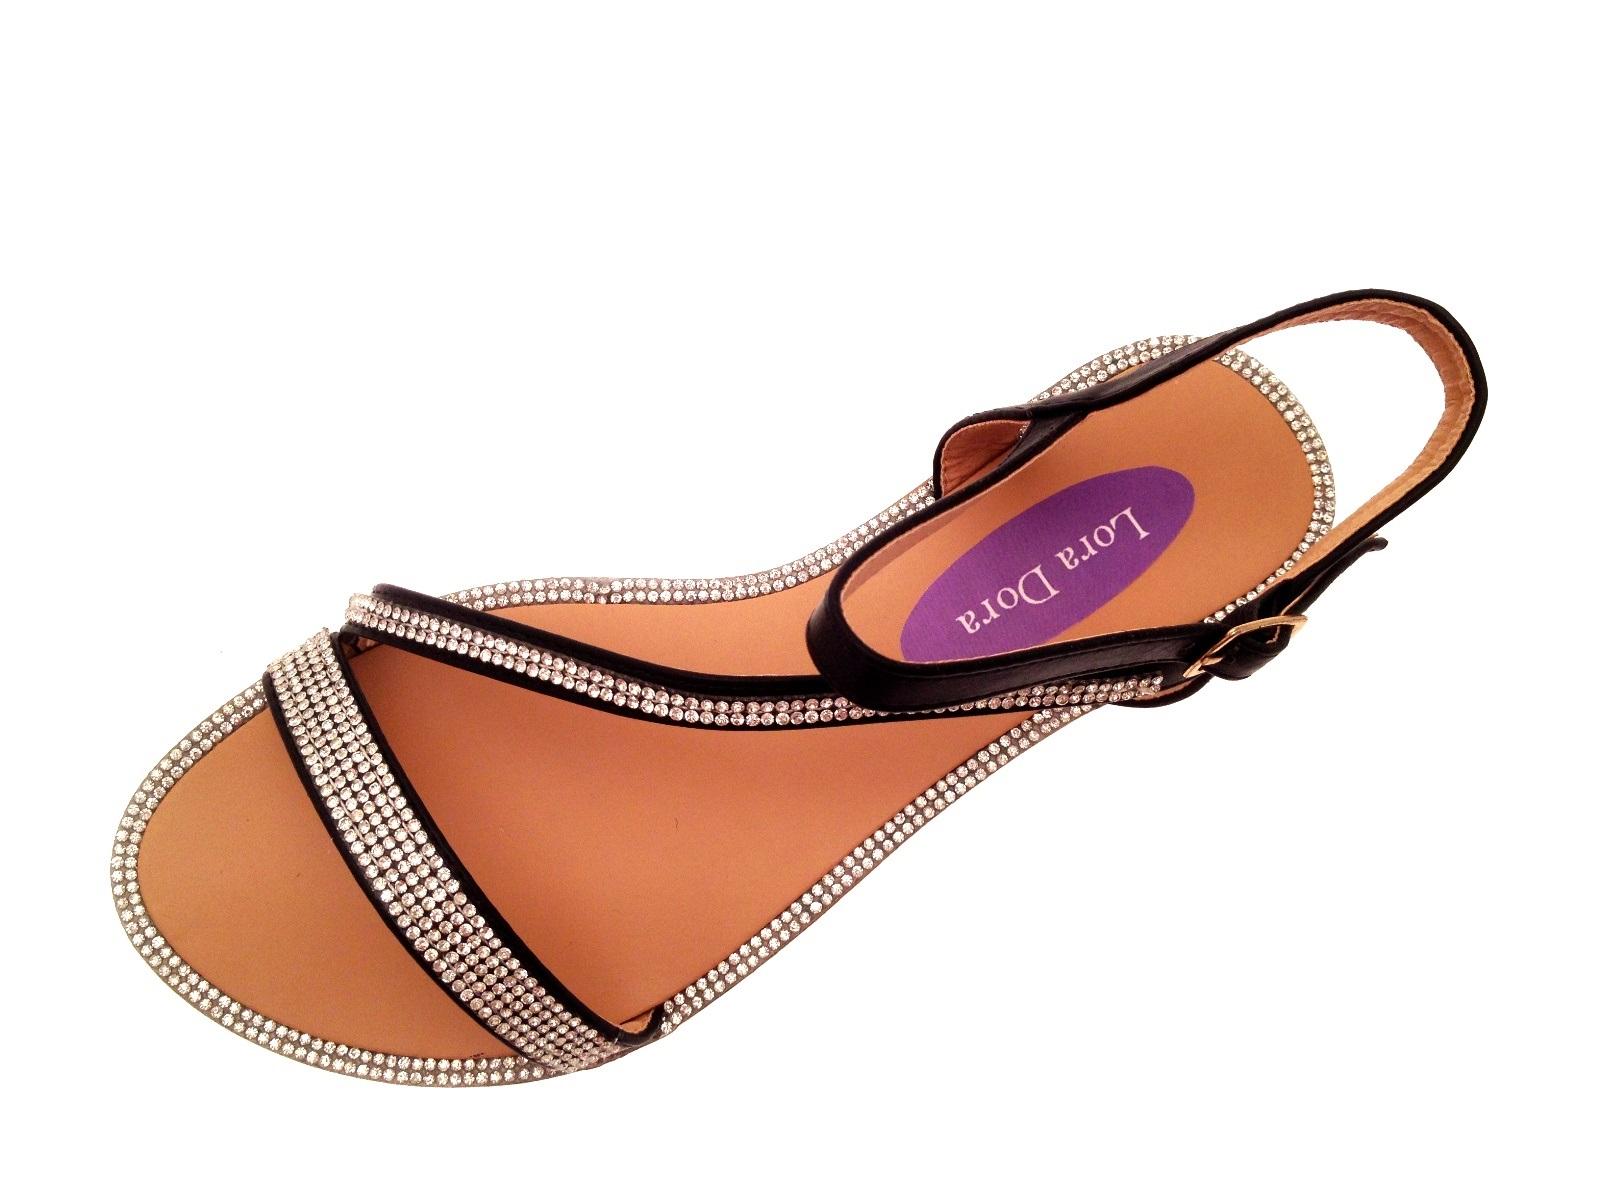 Womens Flat Diamante Summer Sandals Strappy Evening Shoes Ladies Girls Size 3-8 | EBay